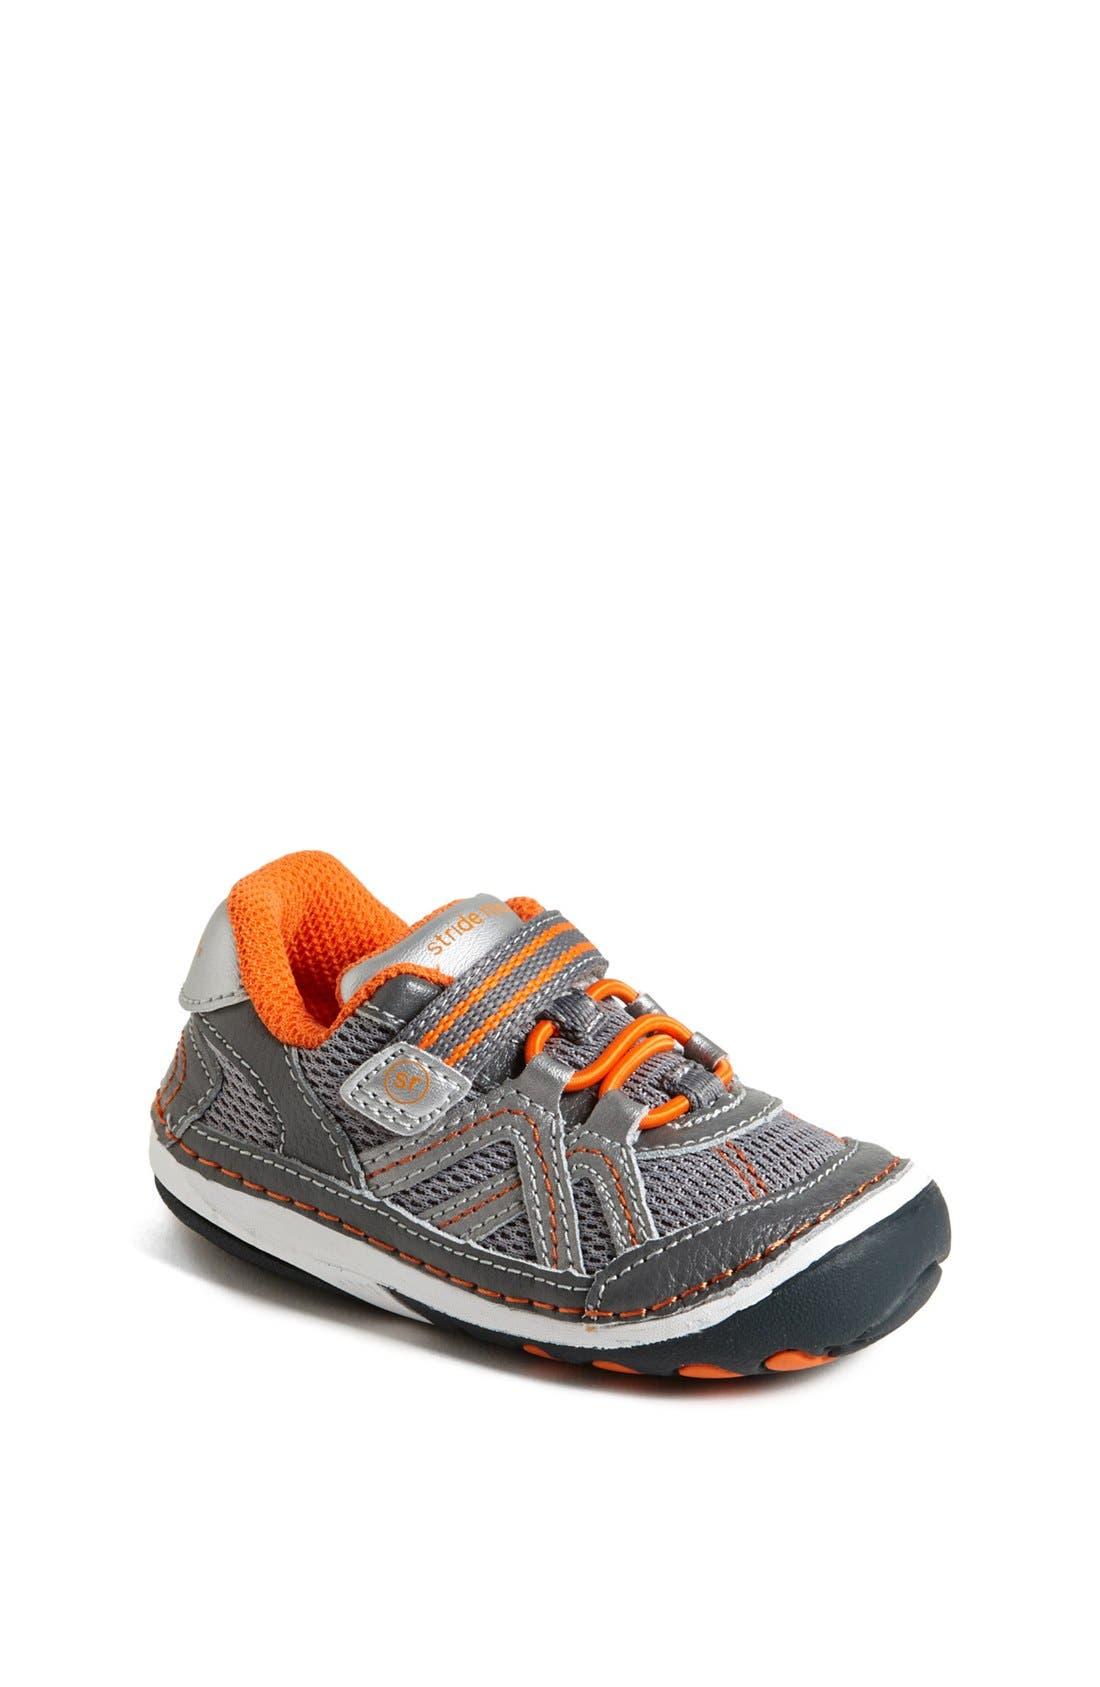 Main Image - Stride Rite 'Damien' Sneaker (Baby & Walker)